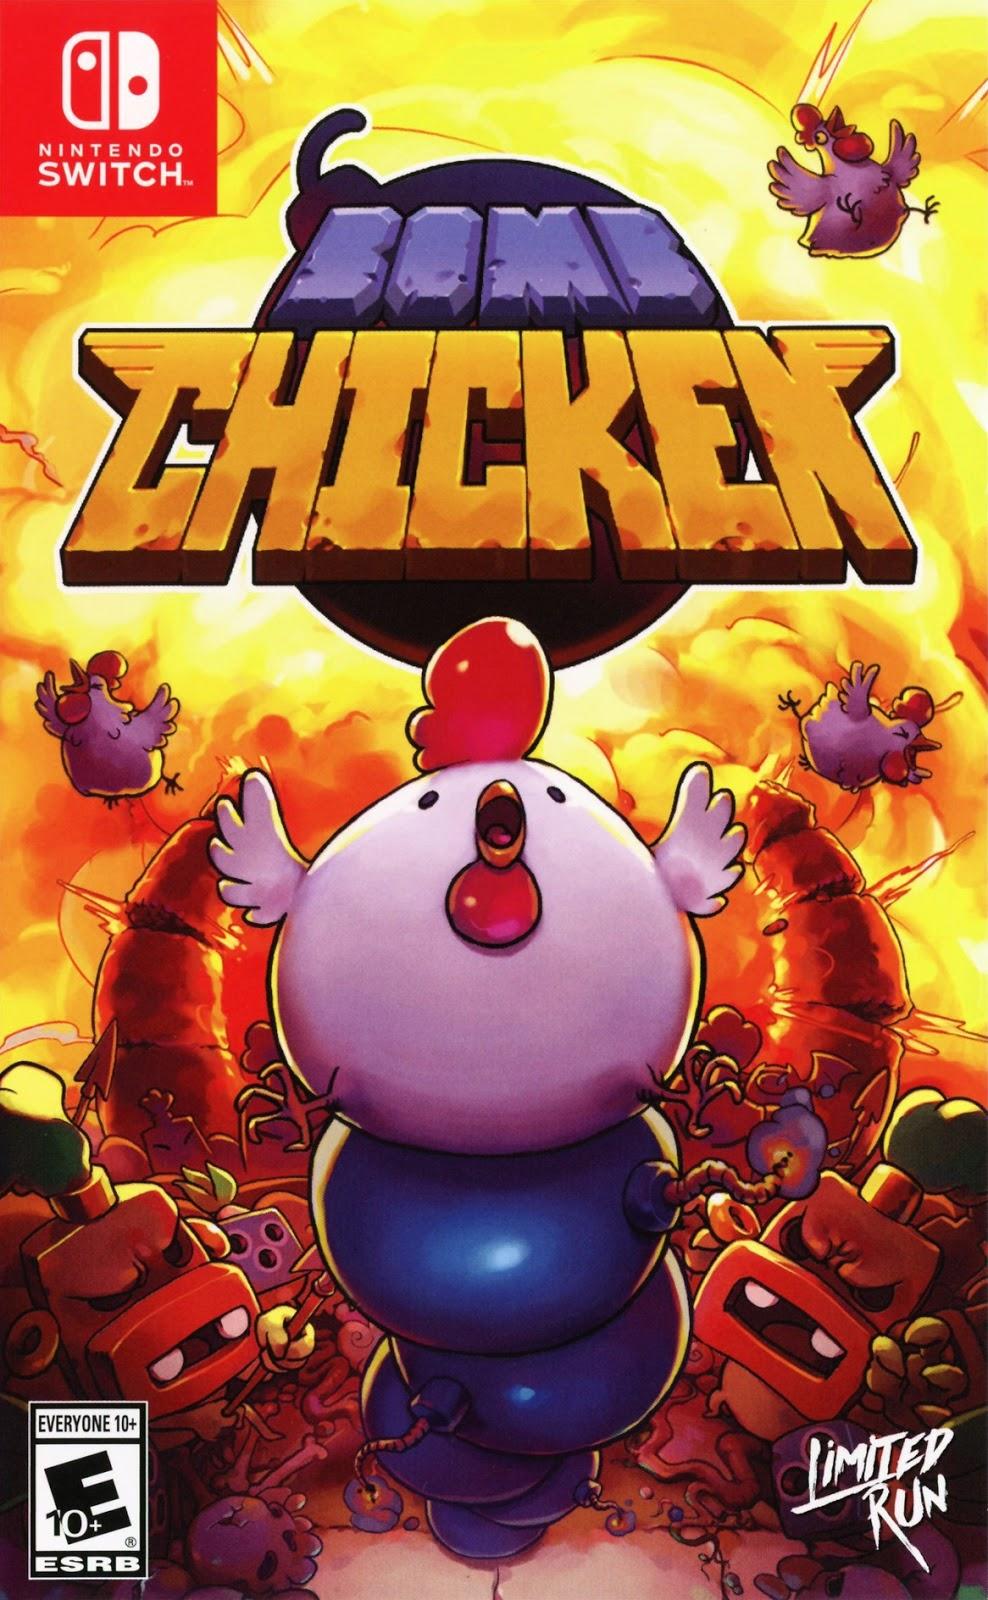 Bomb Chicken Limited Run